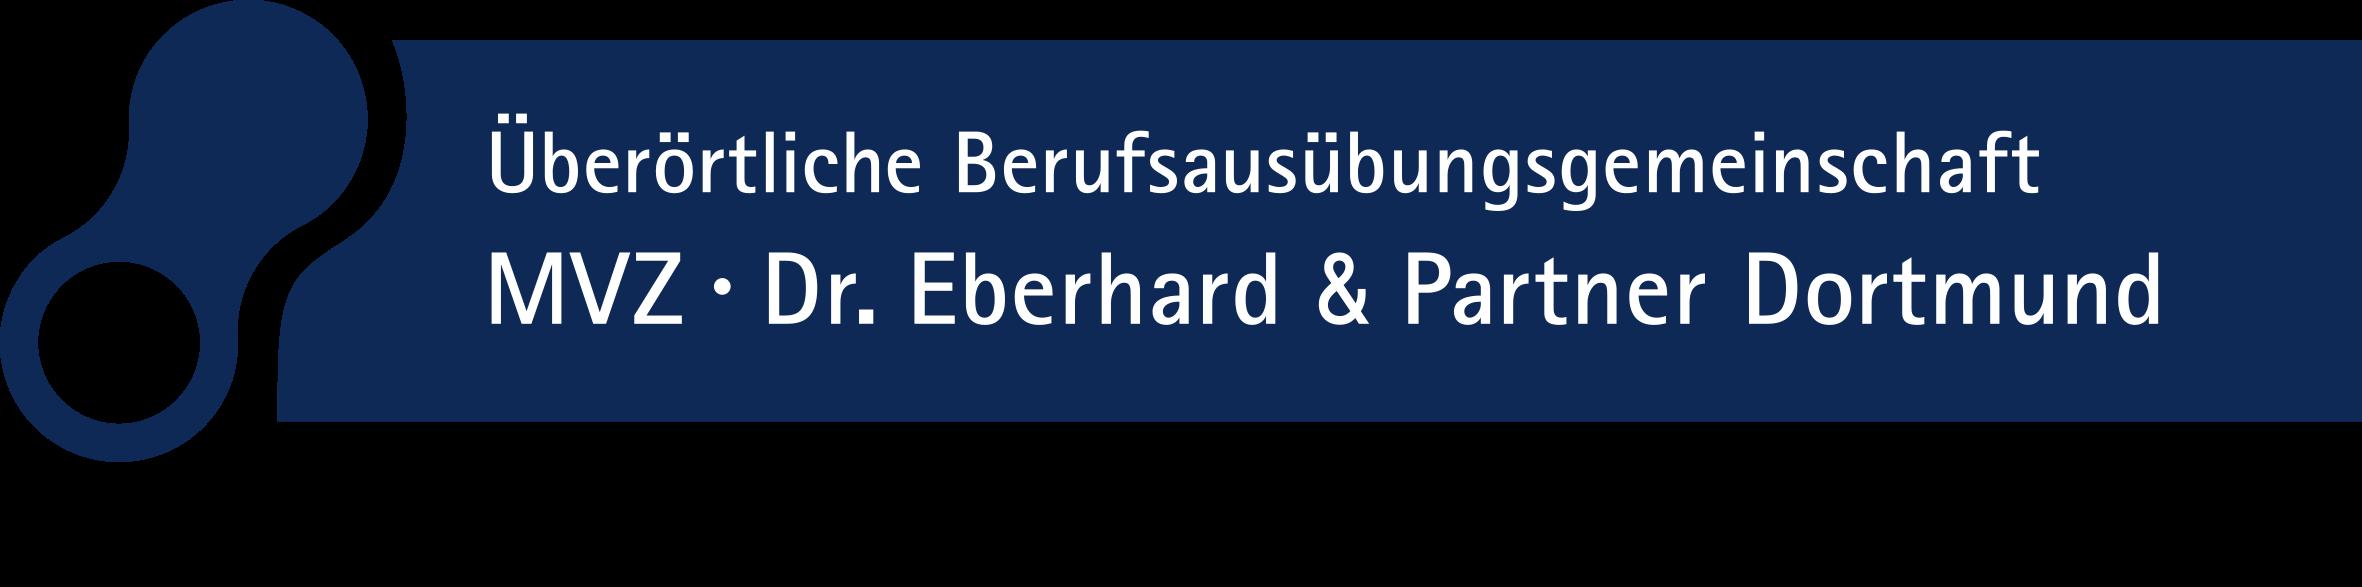 labor eberhard dortmund